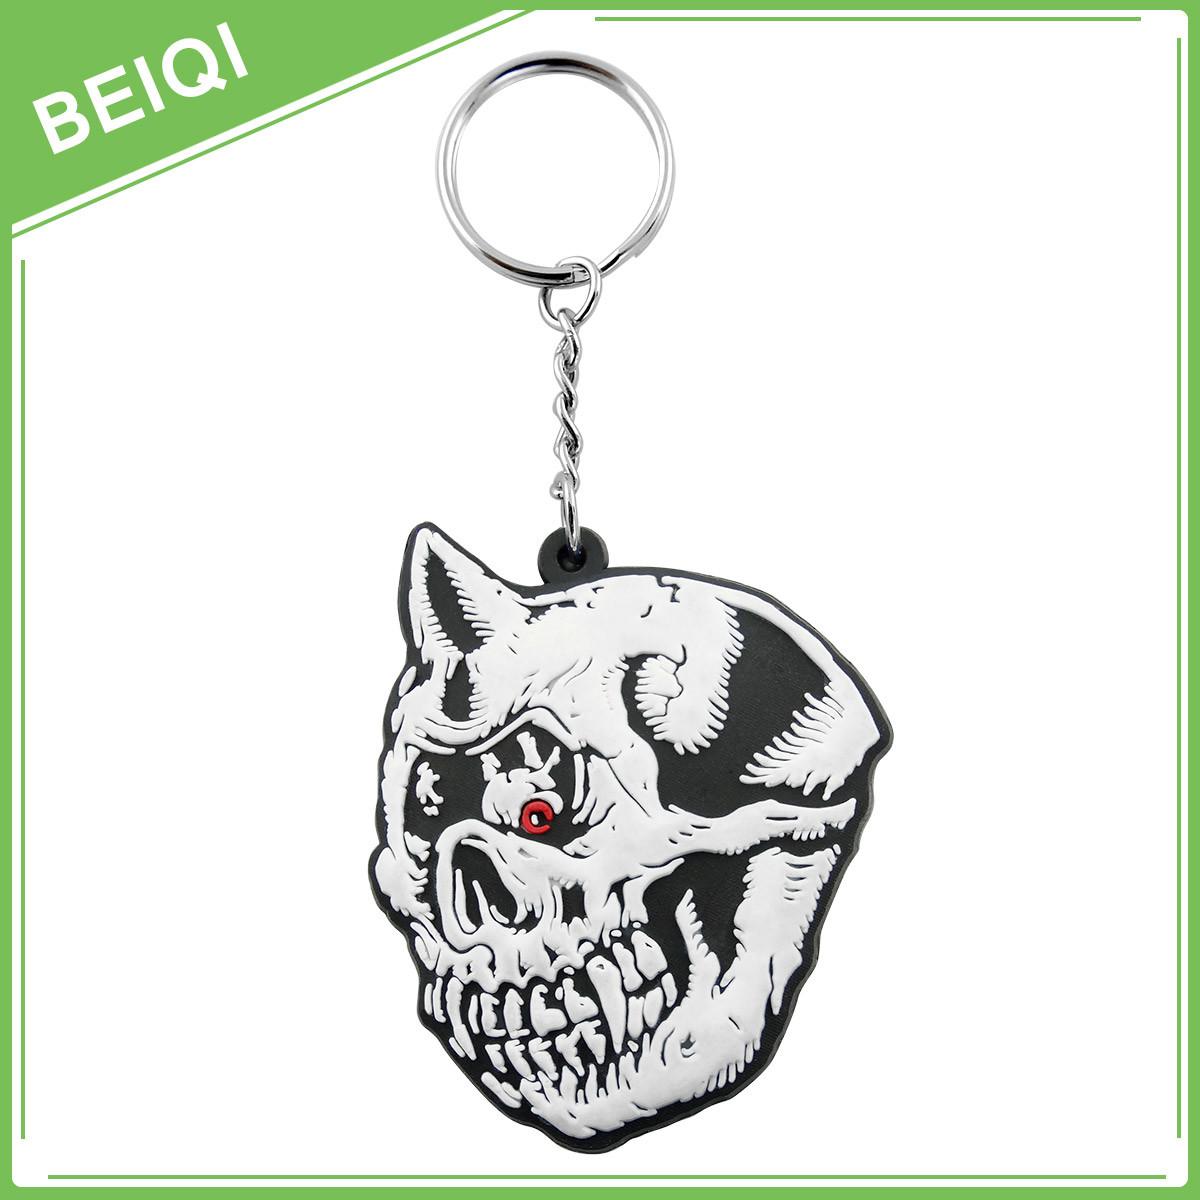 Promotional Gifts Rubber Key Chain / Custom PVC Keychain / Plastic Silicon Keychain